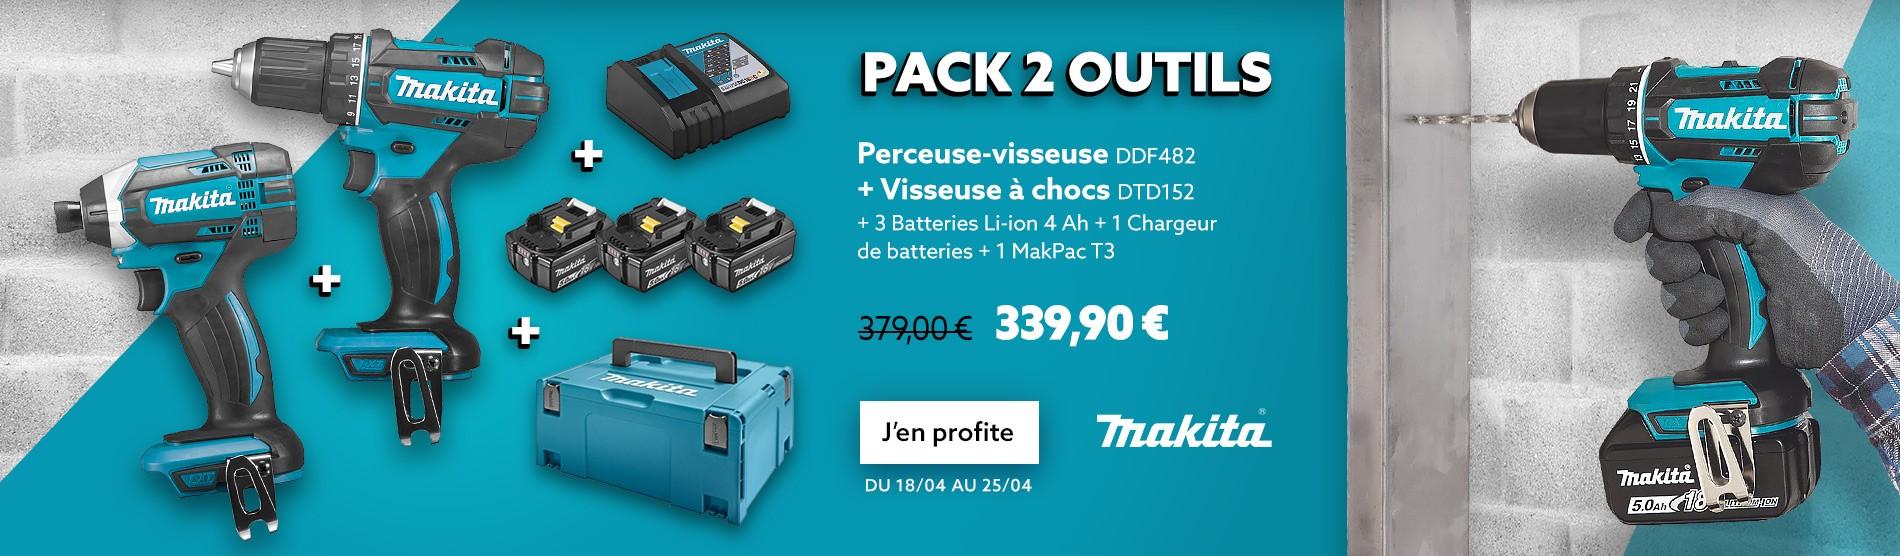 Pack 2 outils MAKITA DLX2127MJ1 (DDF482 + DTD152) 18 V Li-Ion (3 x 4 Ah)